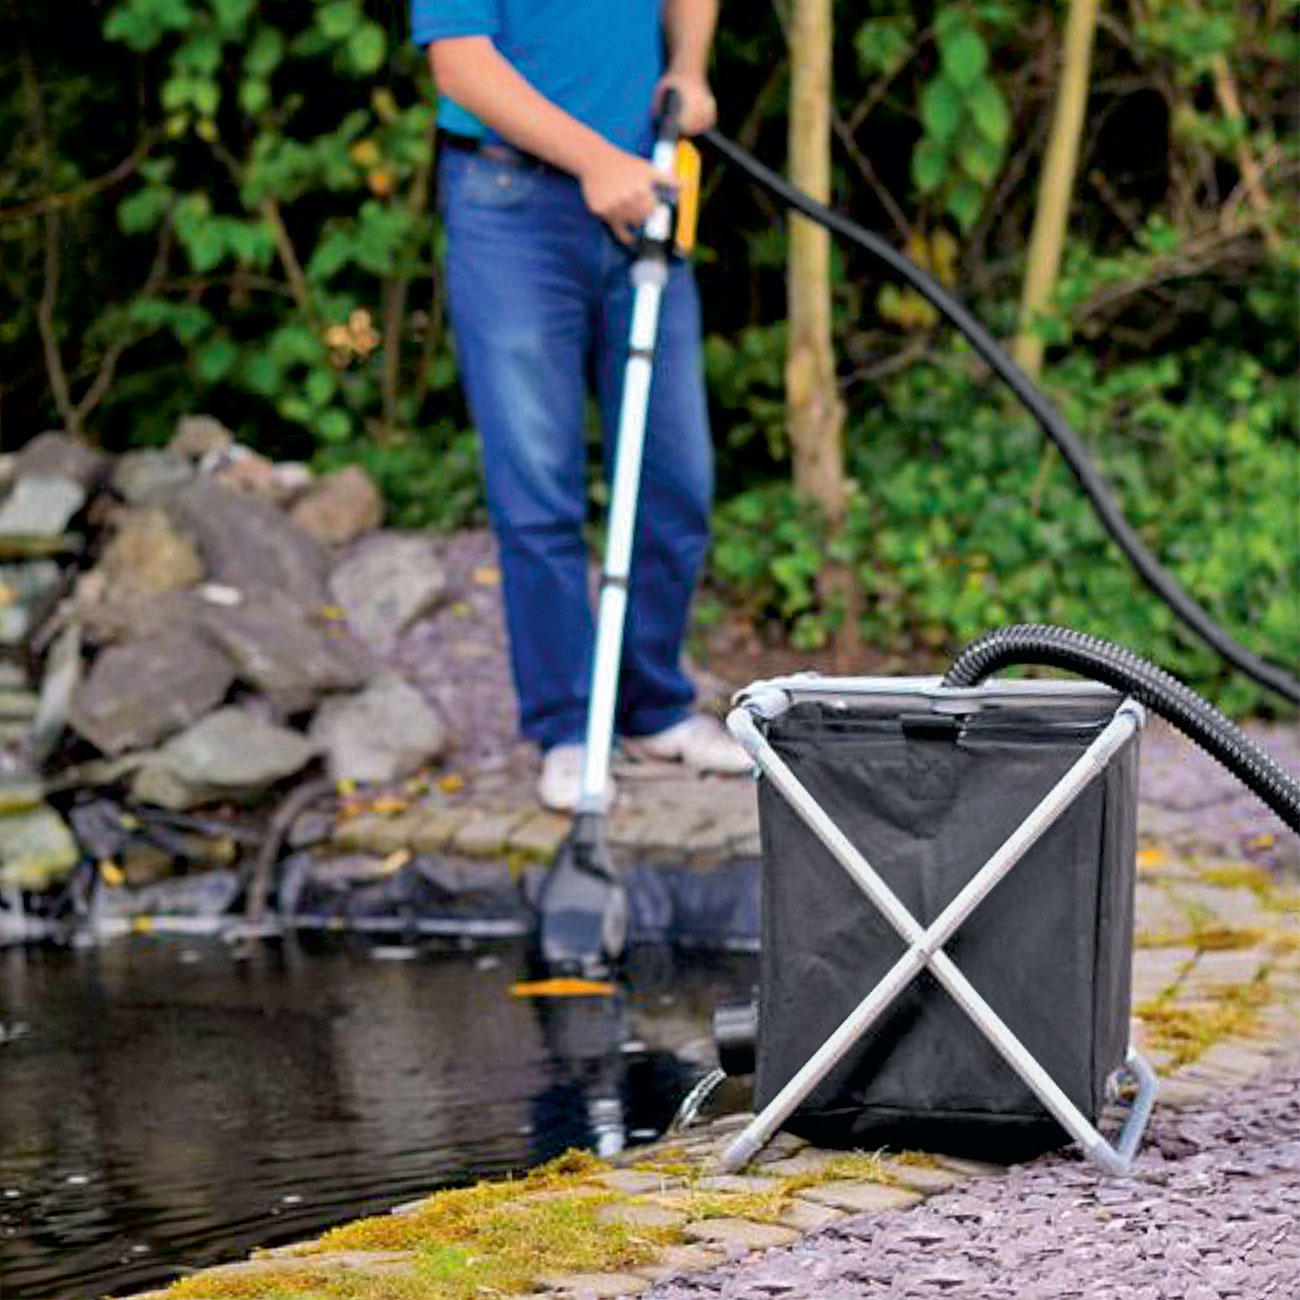 Buy pond vacuum cleaner pond vac online for Pond cleaner